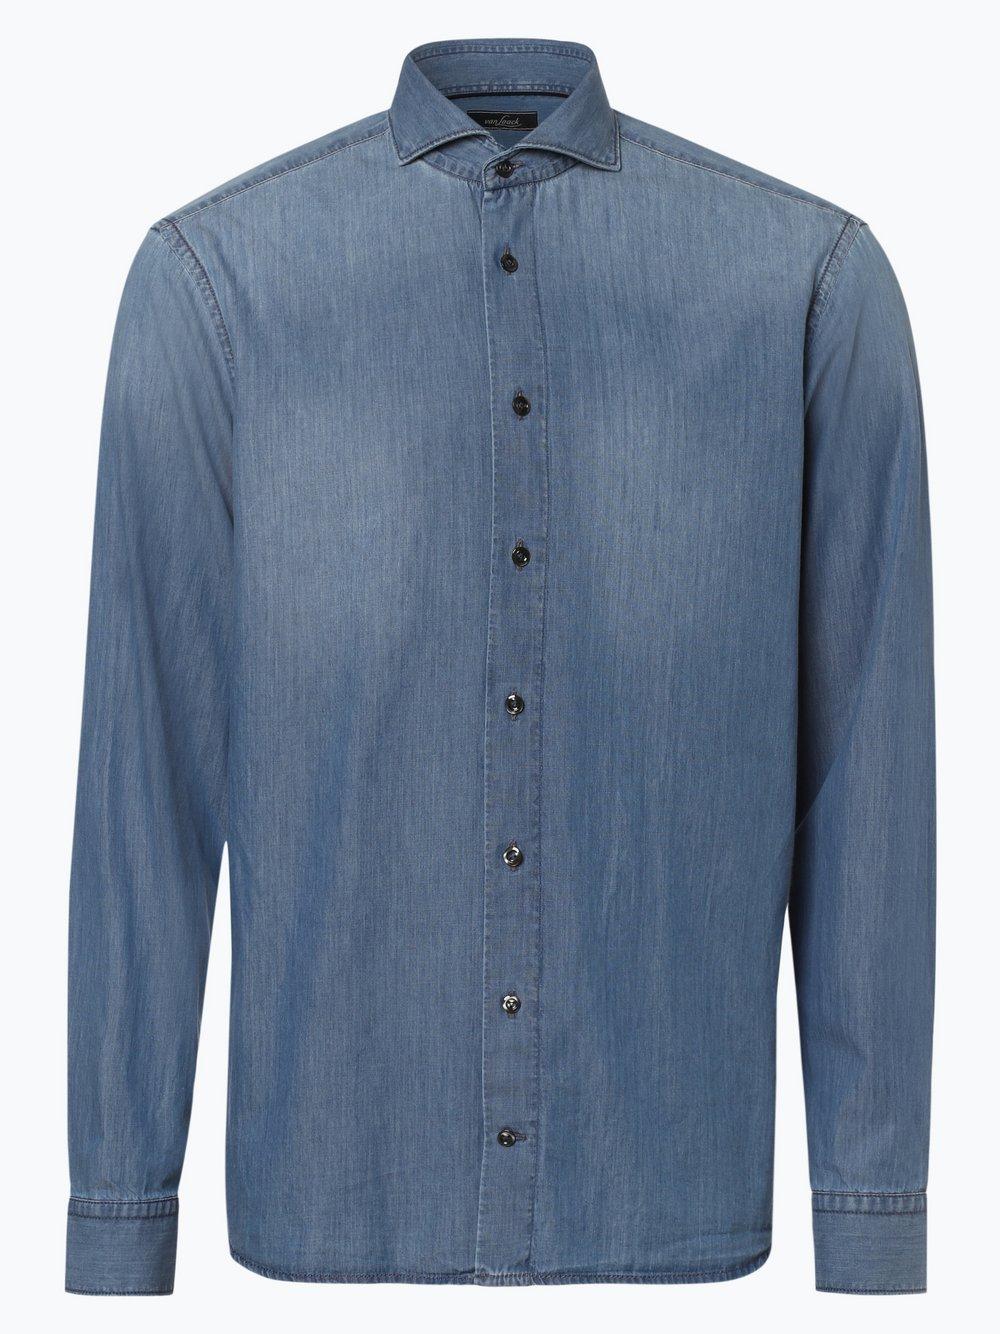 Van Laack – Koszula męska, niebieski Van Graaf 447012-0001-00410